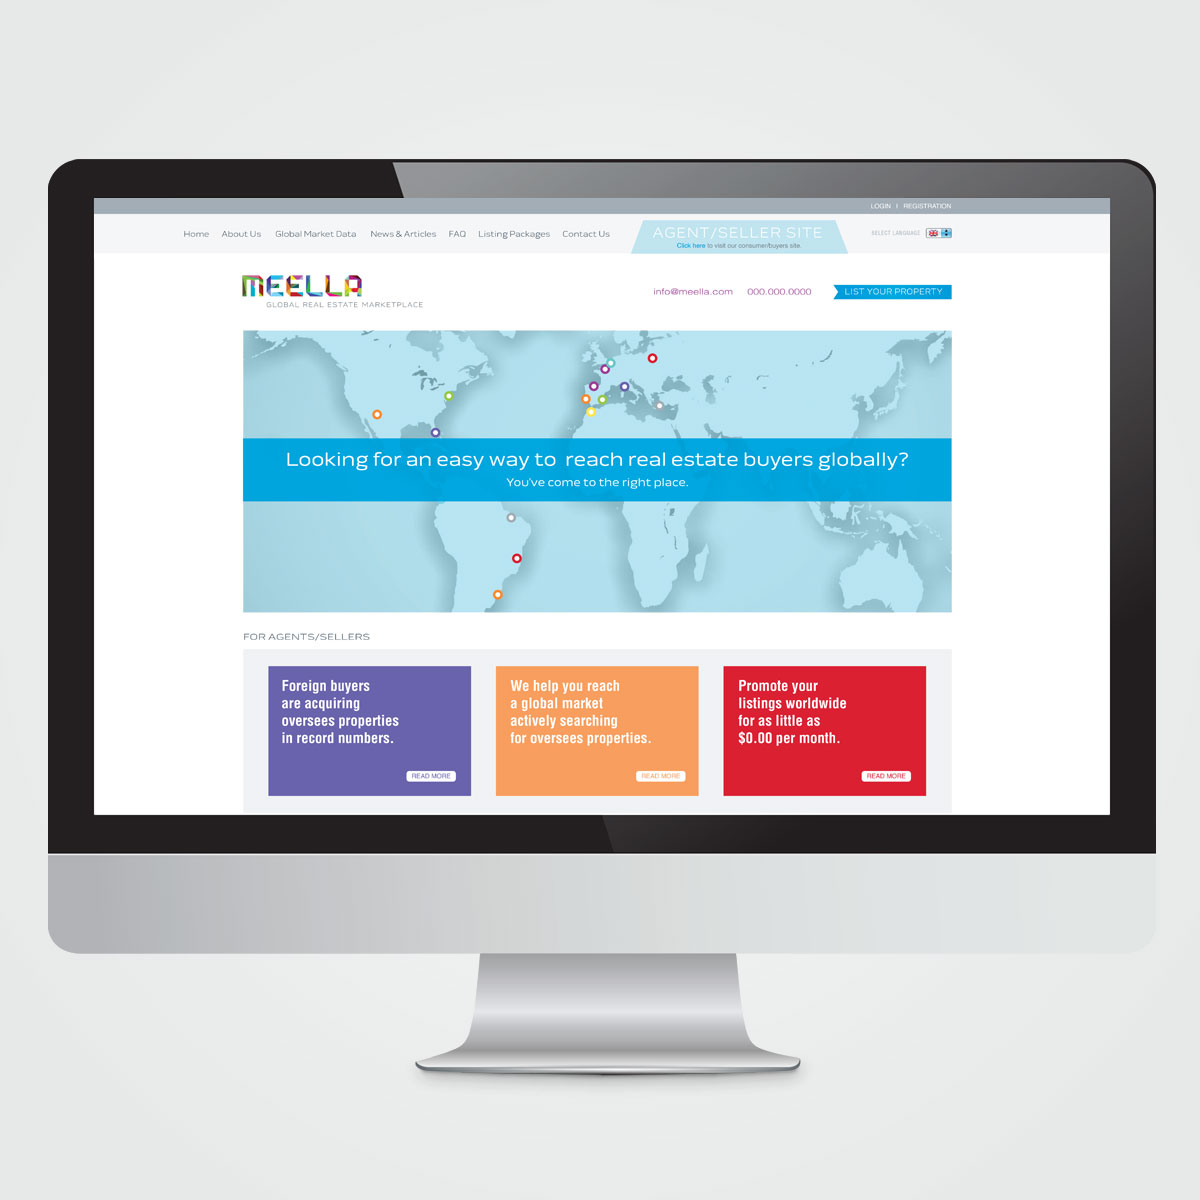 Website design for Meela, a real estate marketing website with international reach